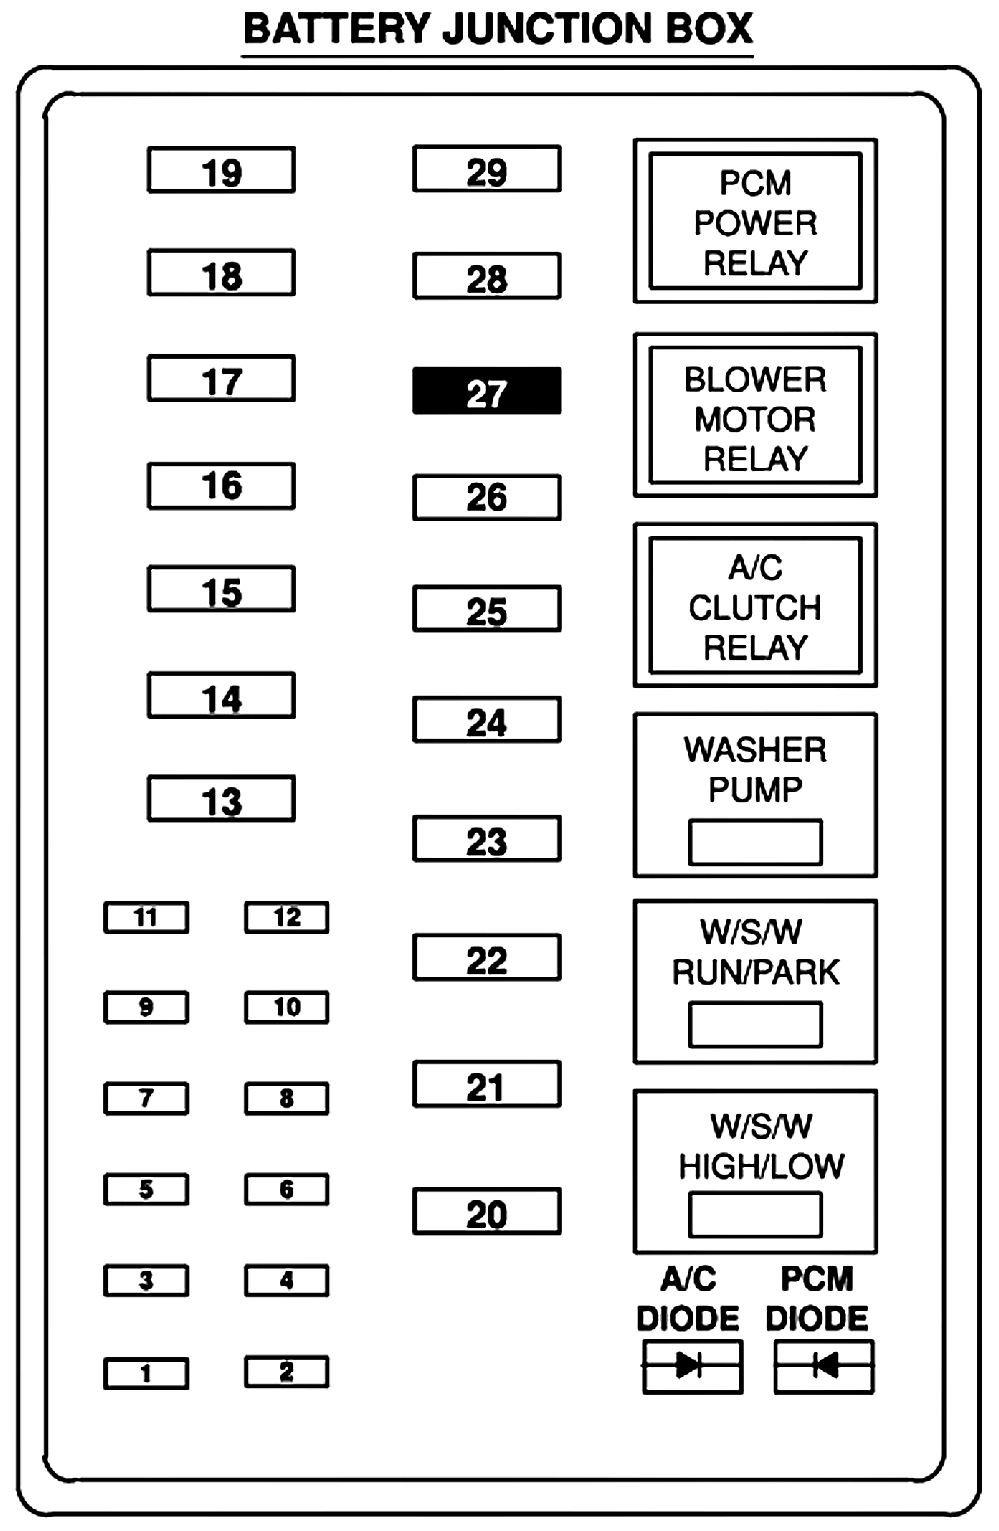 ad_6313] 2001 f250 diesel fuse diagram download diagram  pical ponge wigeg mohammedshrine librar wiring 101